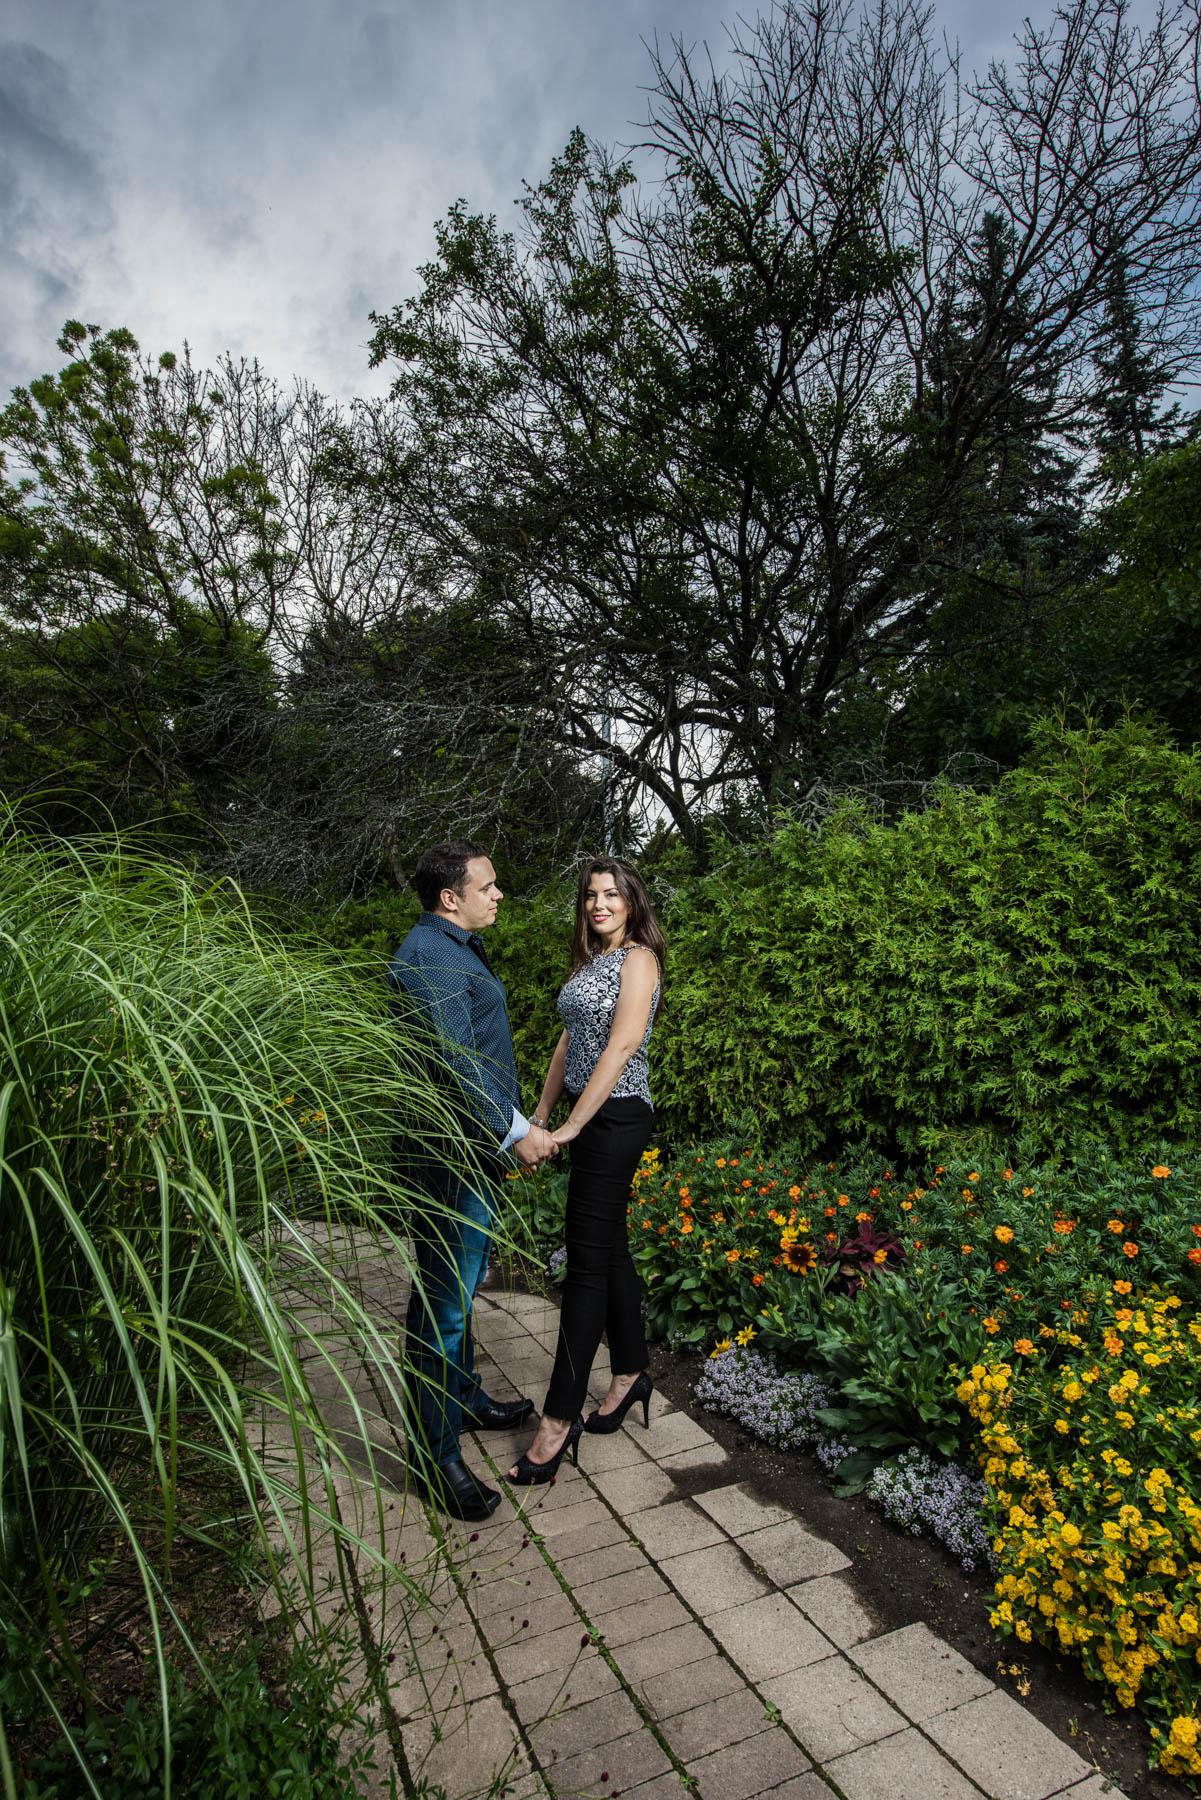 020 - Engagement JJ Alexander Muir Memorial Gardens